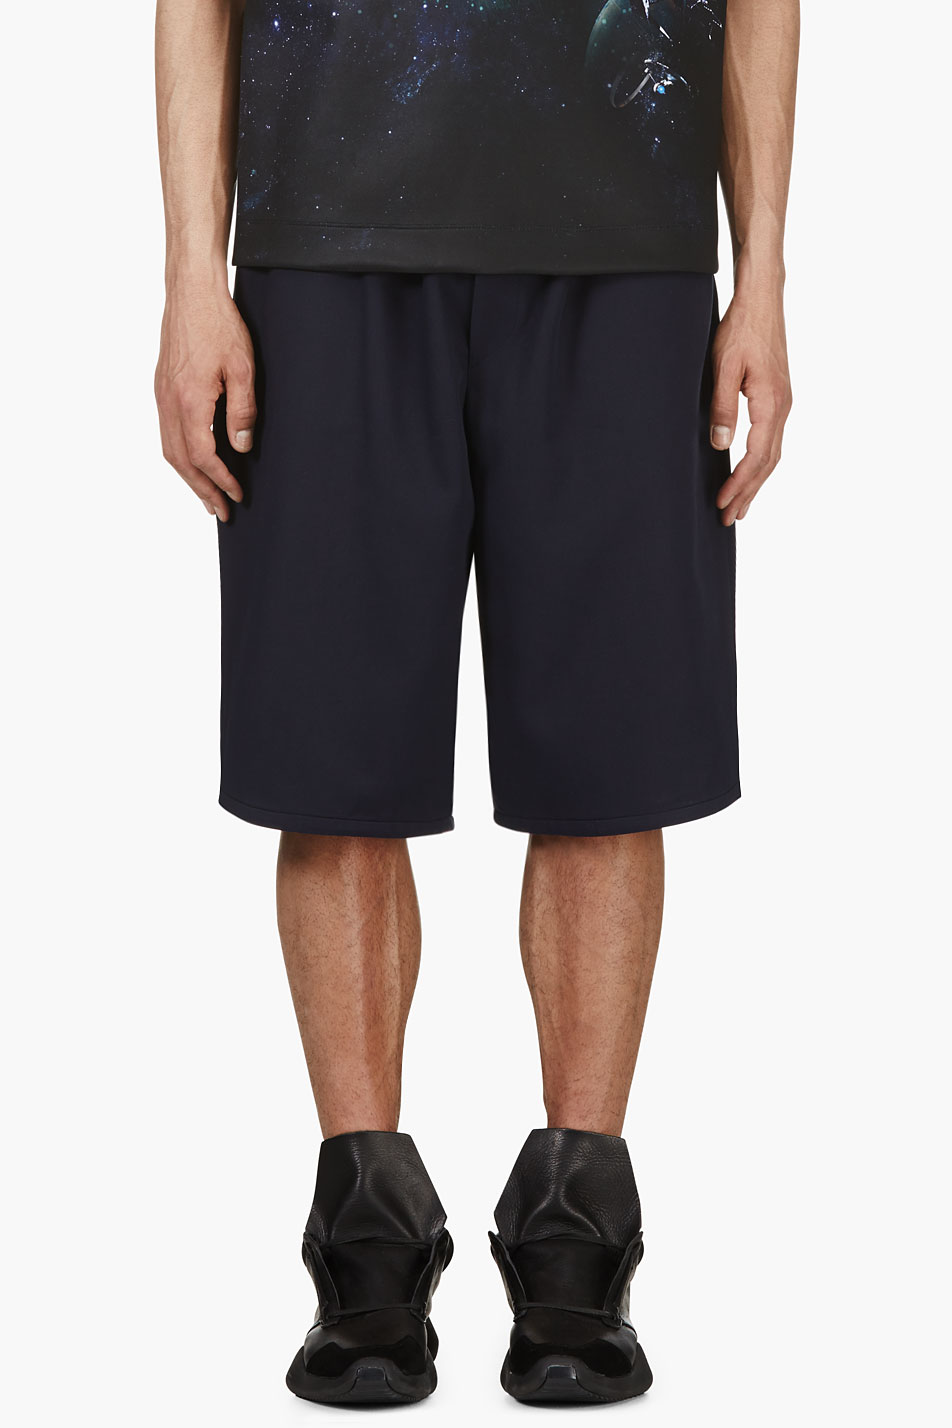 juun.j ssense exclusive navy basketball shorts